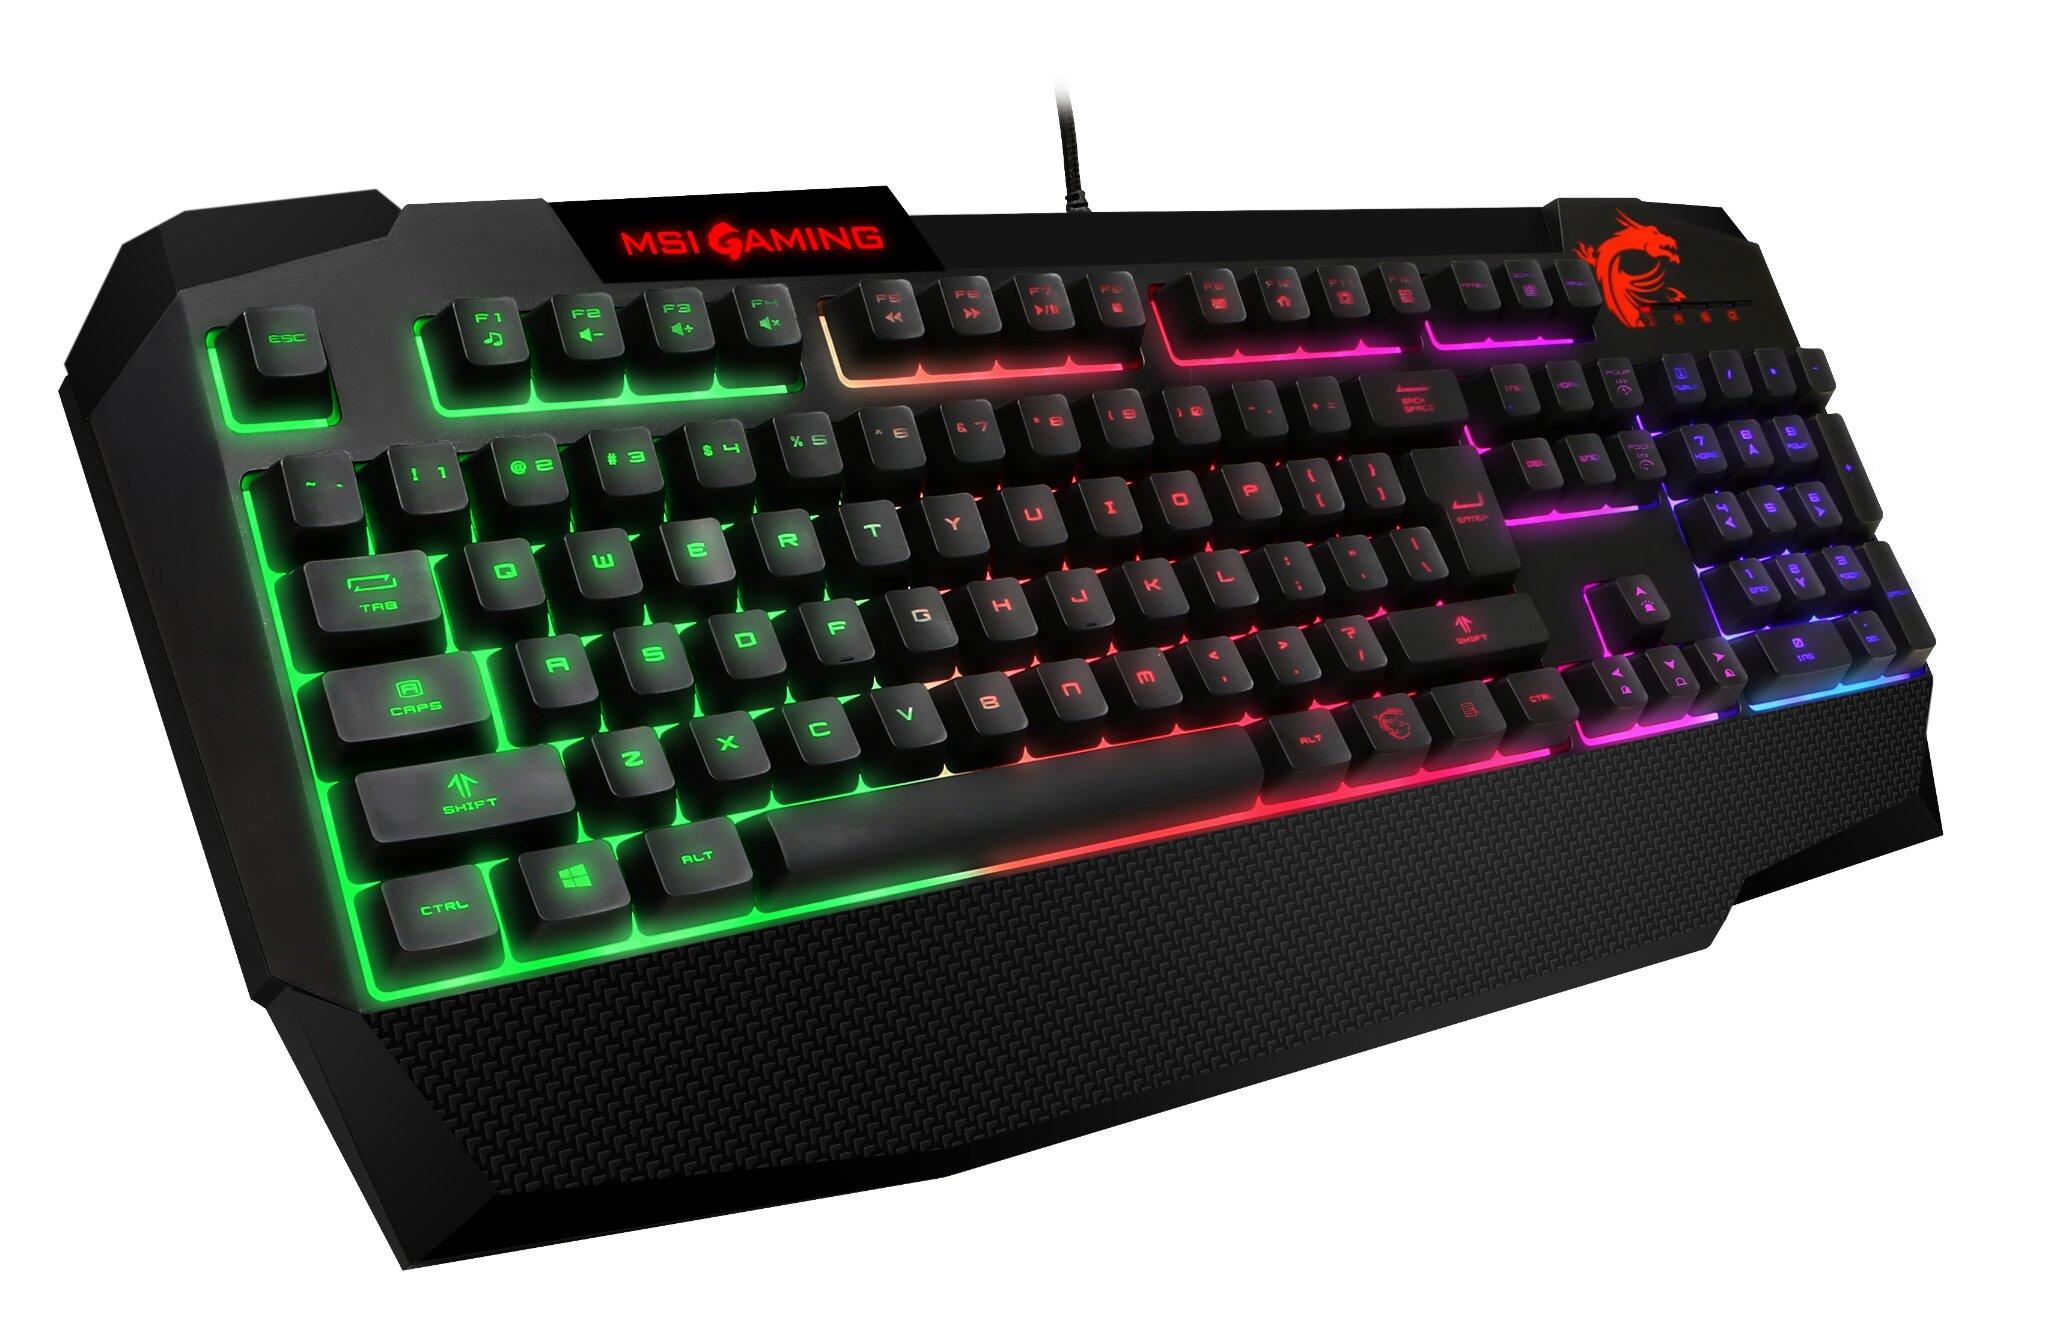 Bàn phím - Keyboard MSI GK40